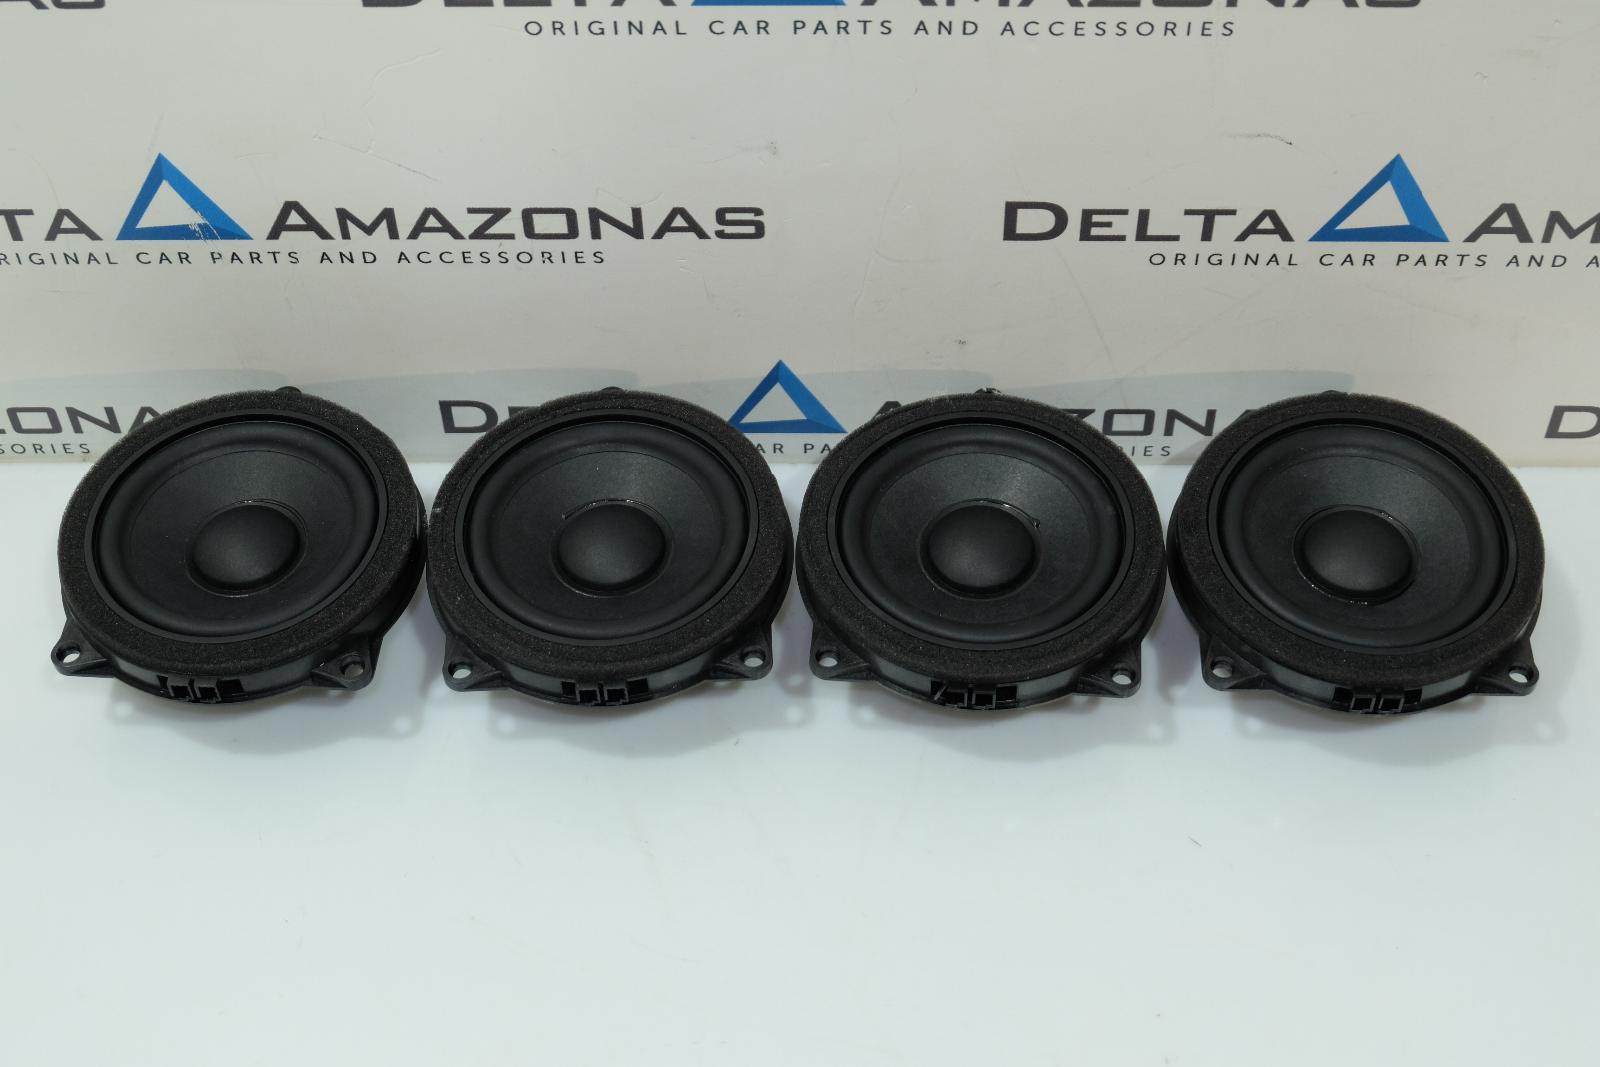 BMW G01 X3 Top HiFi Harman Kardon Sound System Subwoofer Amplifier ...